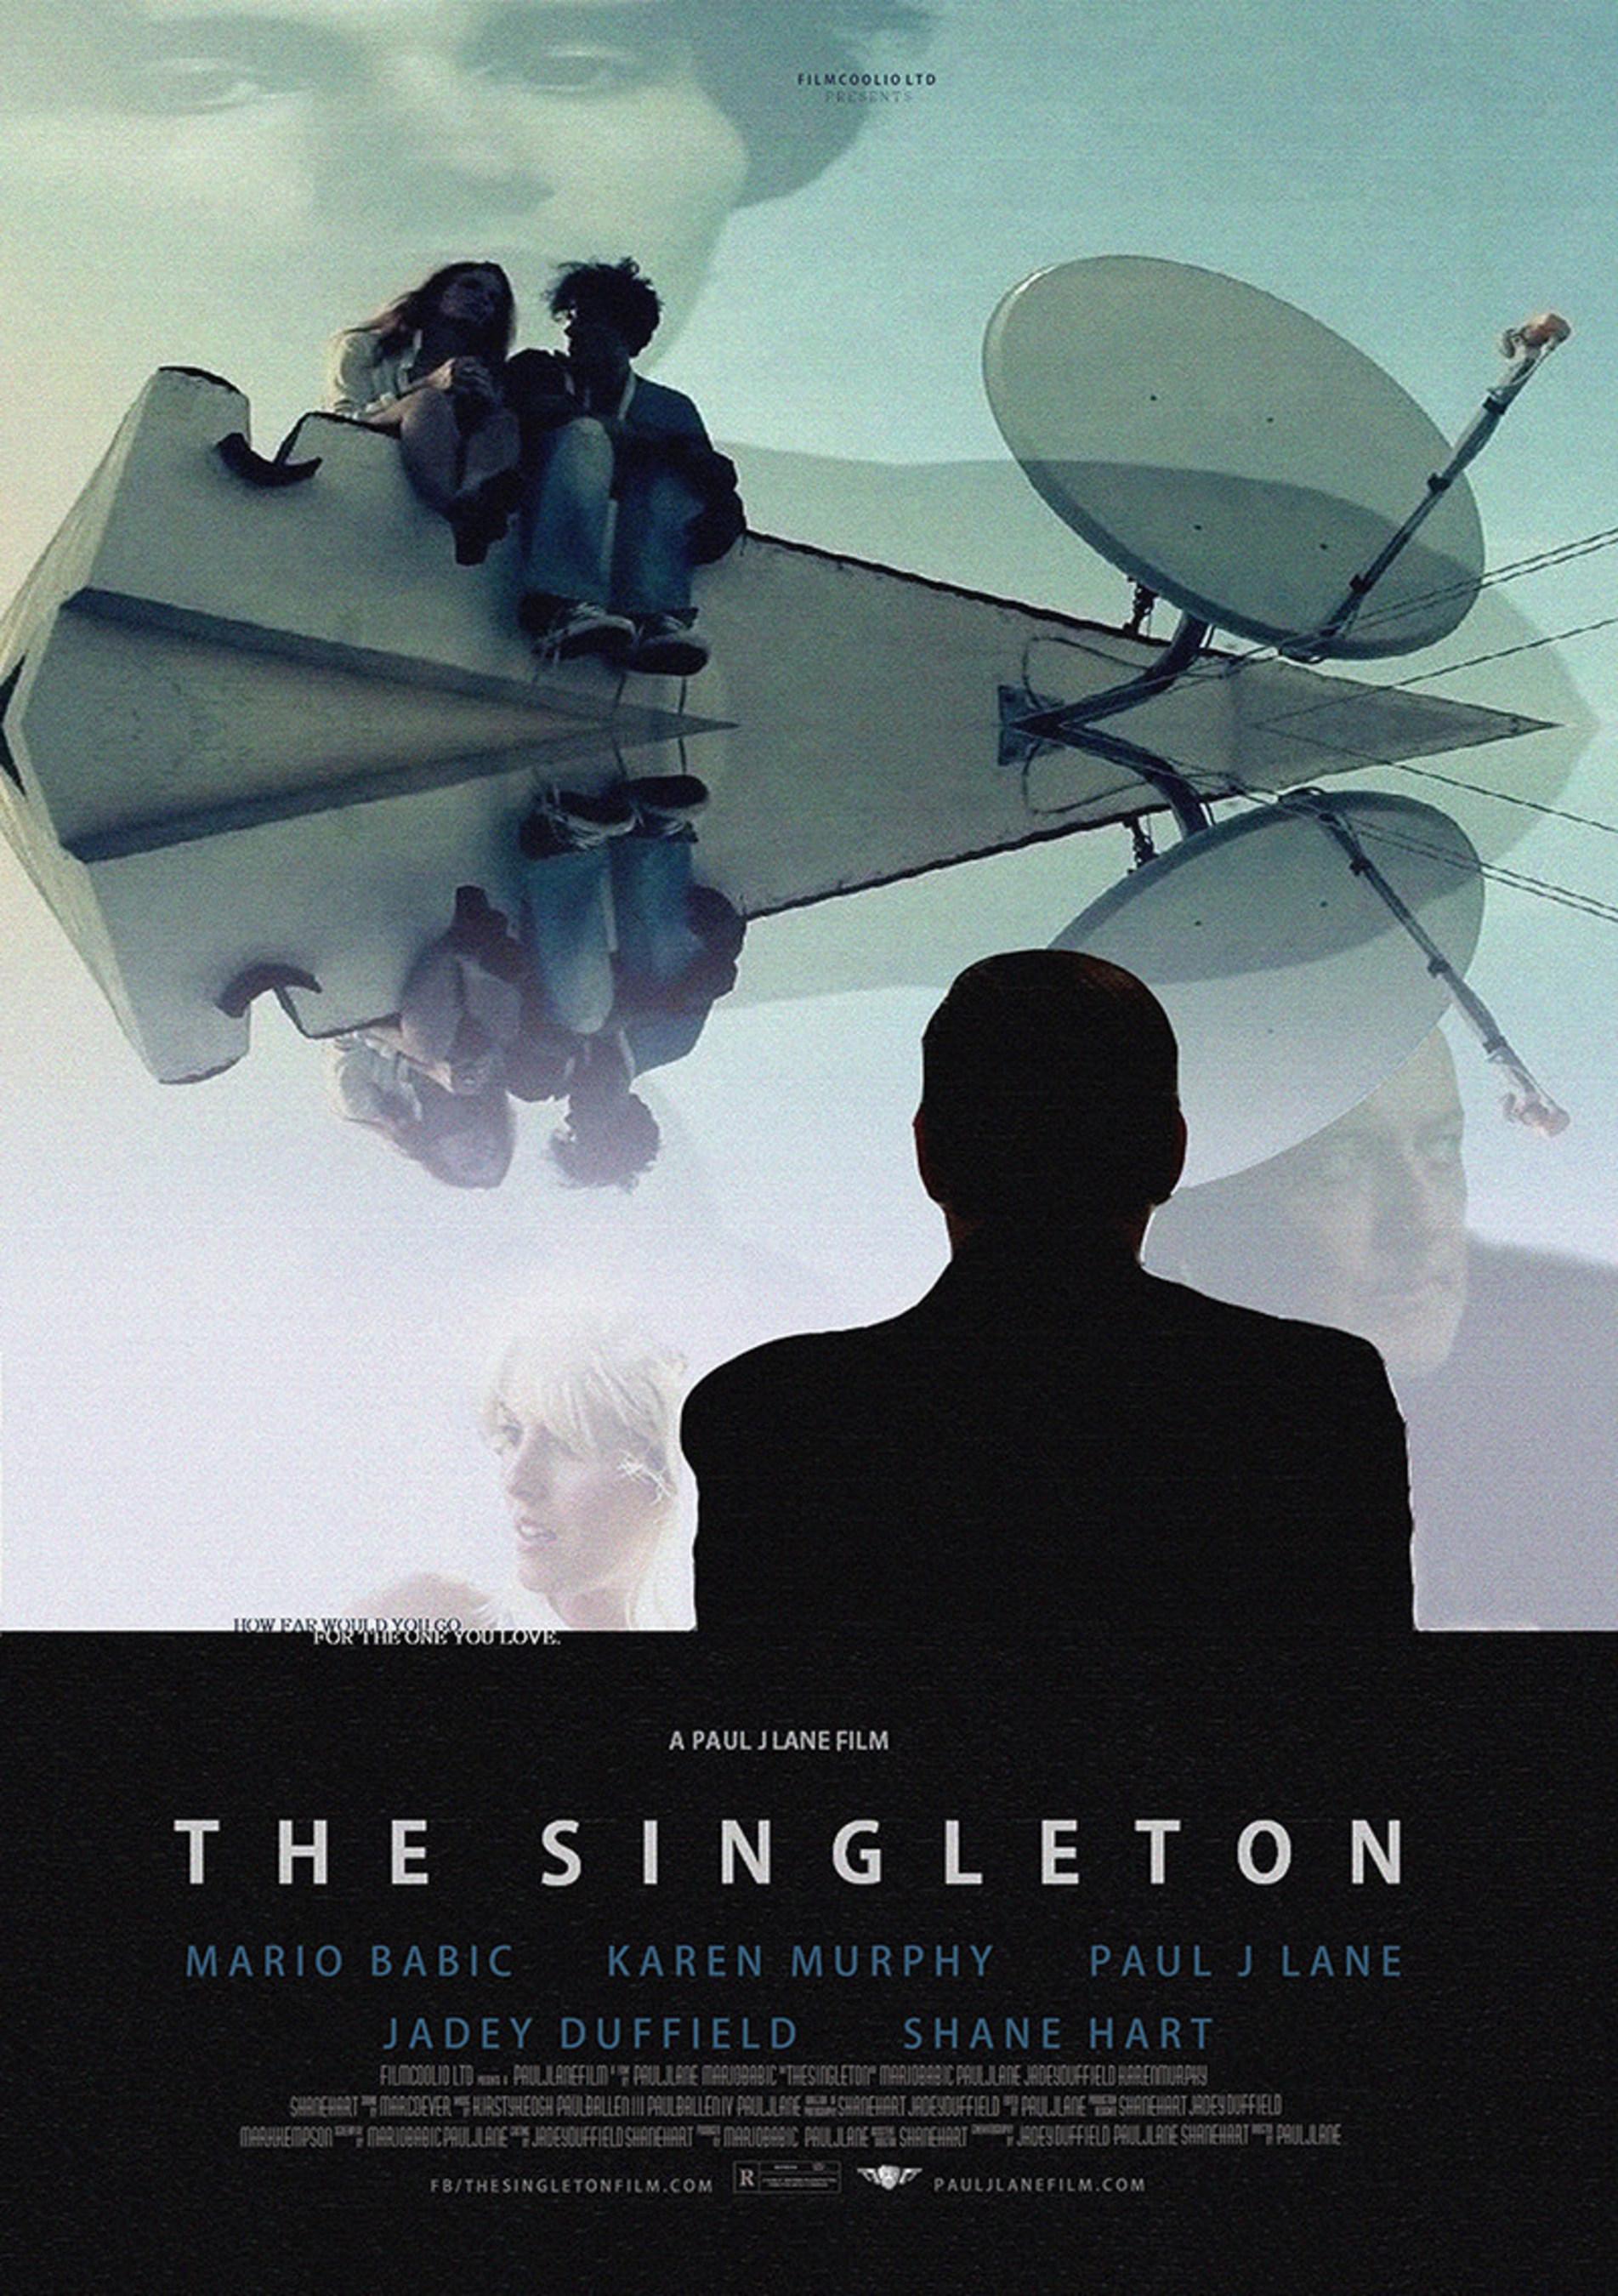 The Film Poster for 'The Singleton' Has Arrived - starring Mario Babic, Karen Murphy, Paul J. Lane, Jadey Duffield and Shane Hart